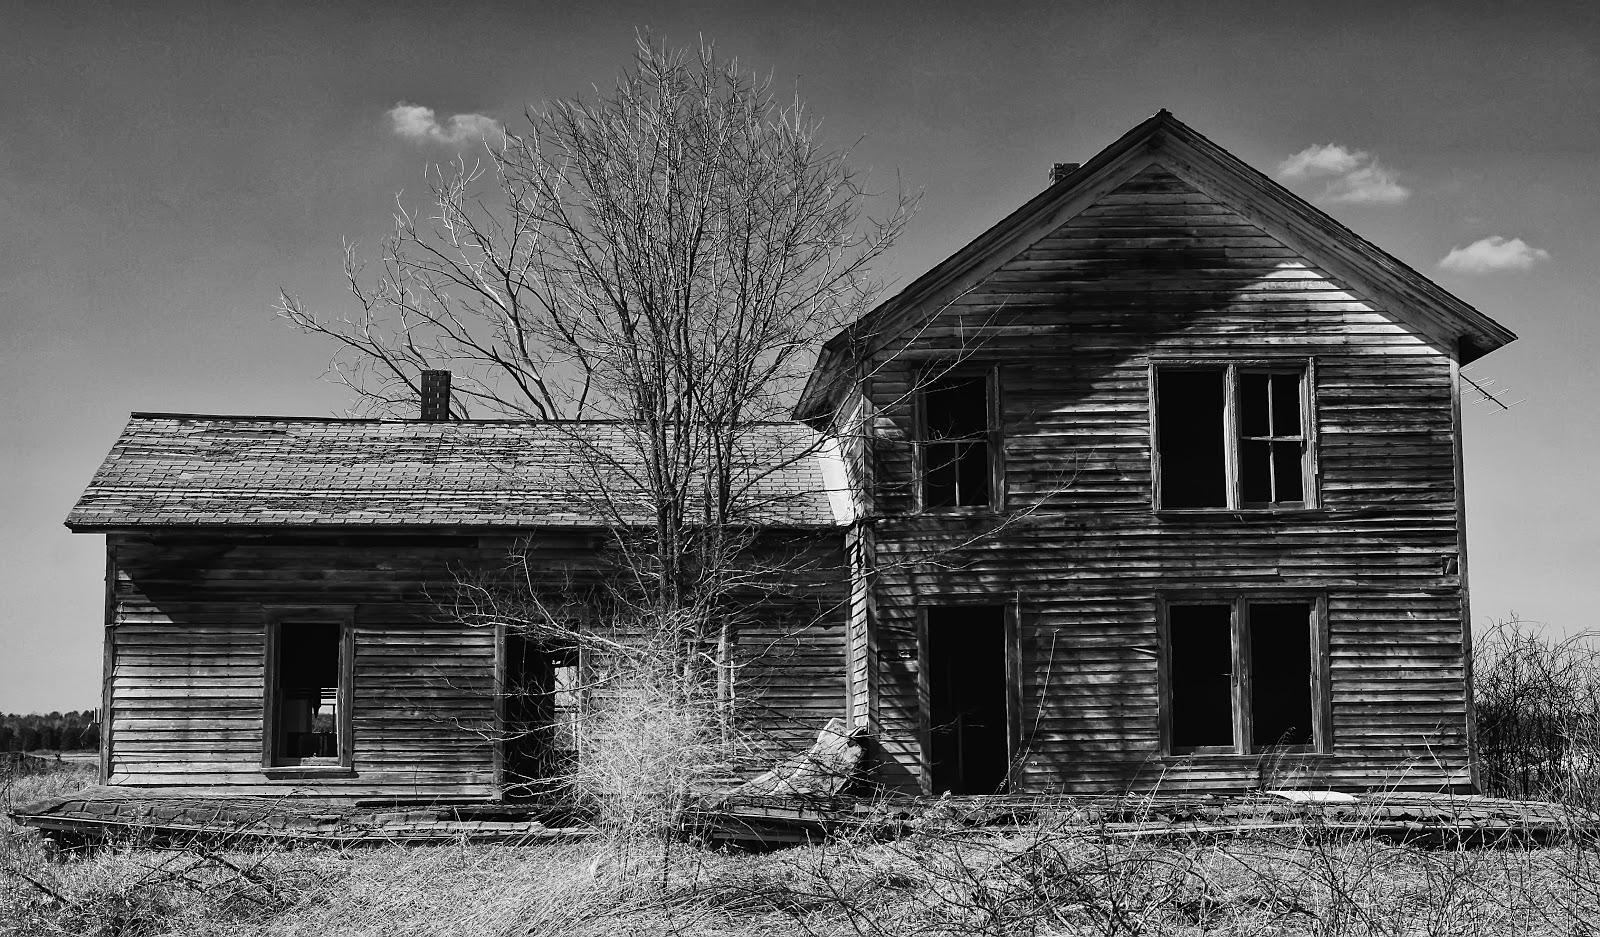 Farm house in need of repair